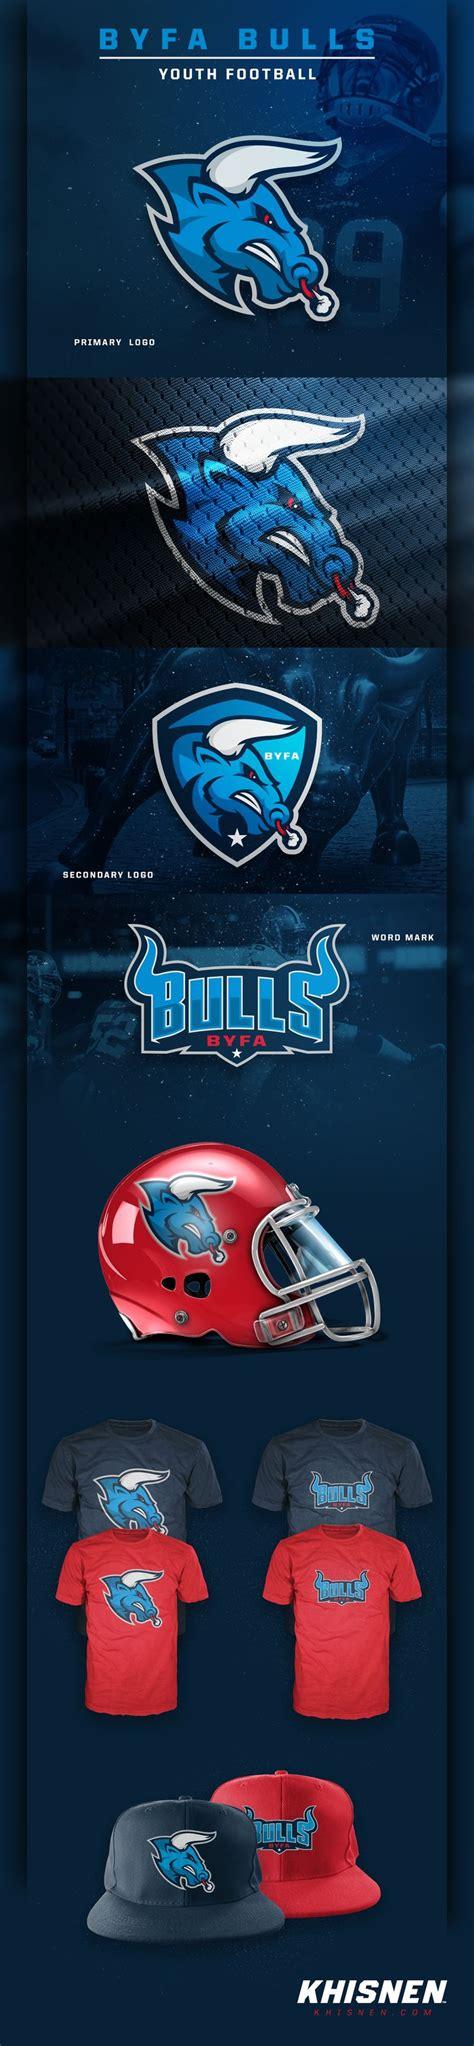 mas de  ideas increibles sobre logos deportivos en